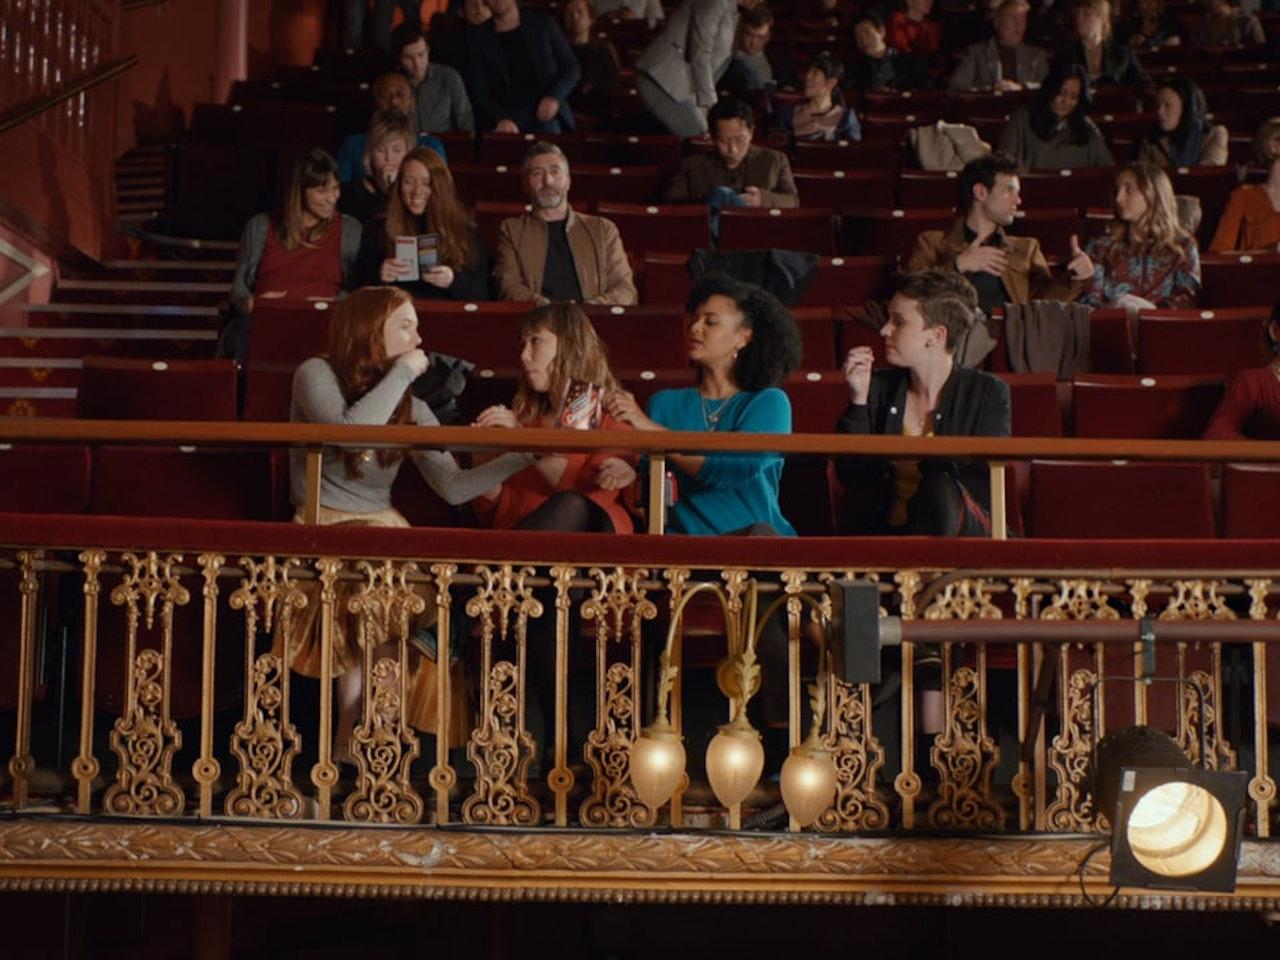 McVities - 'Sweet' Theatre 30sec